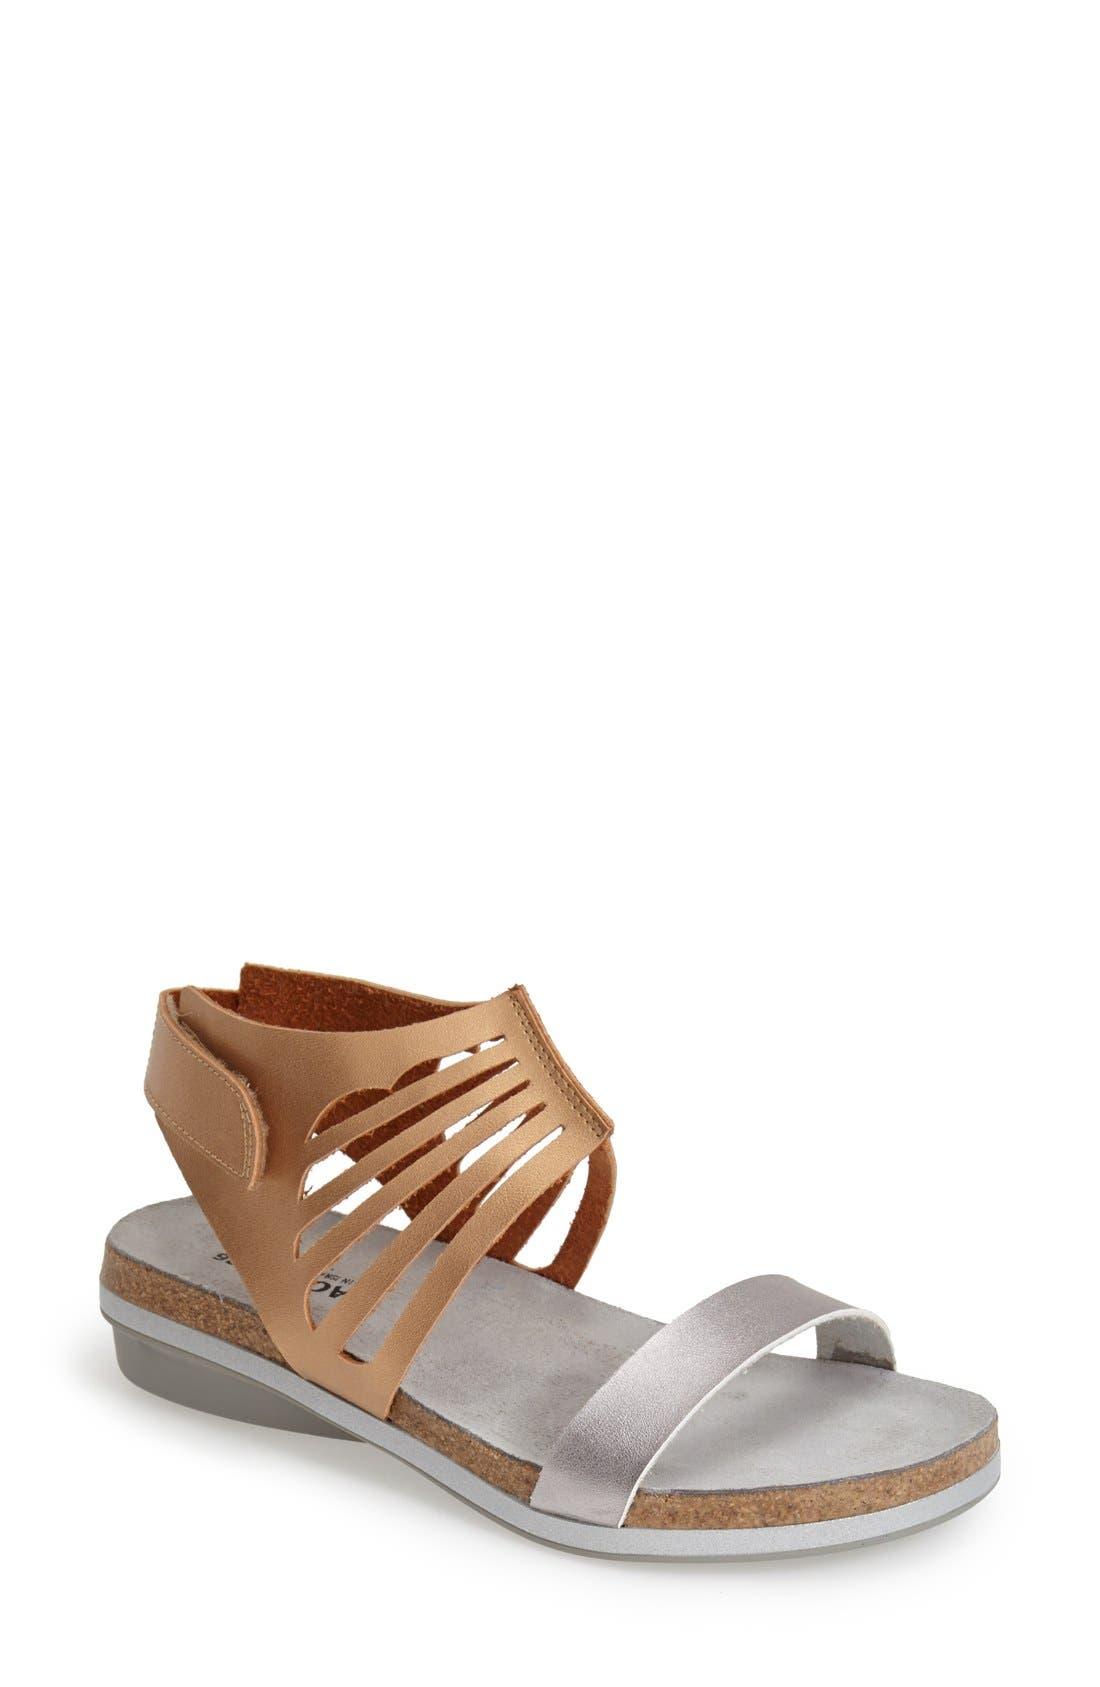 Alternate Image 1 Selected - Naot 'Mint' Sandal (Women)